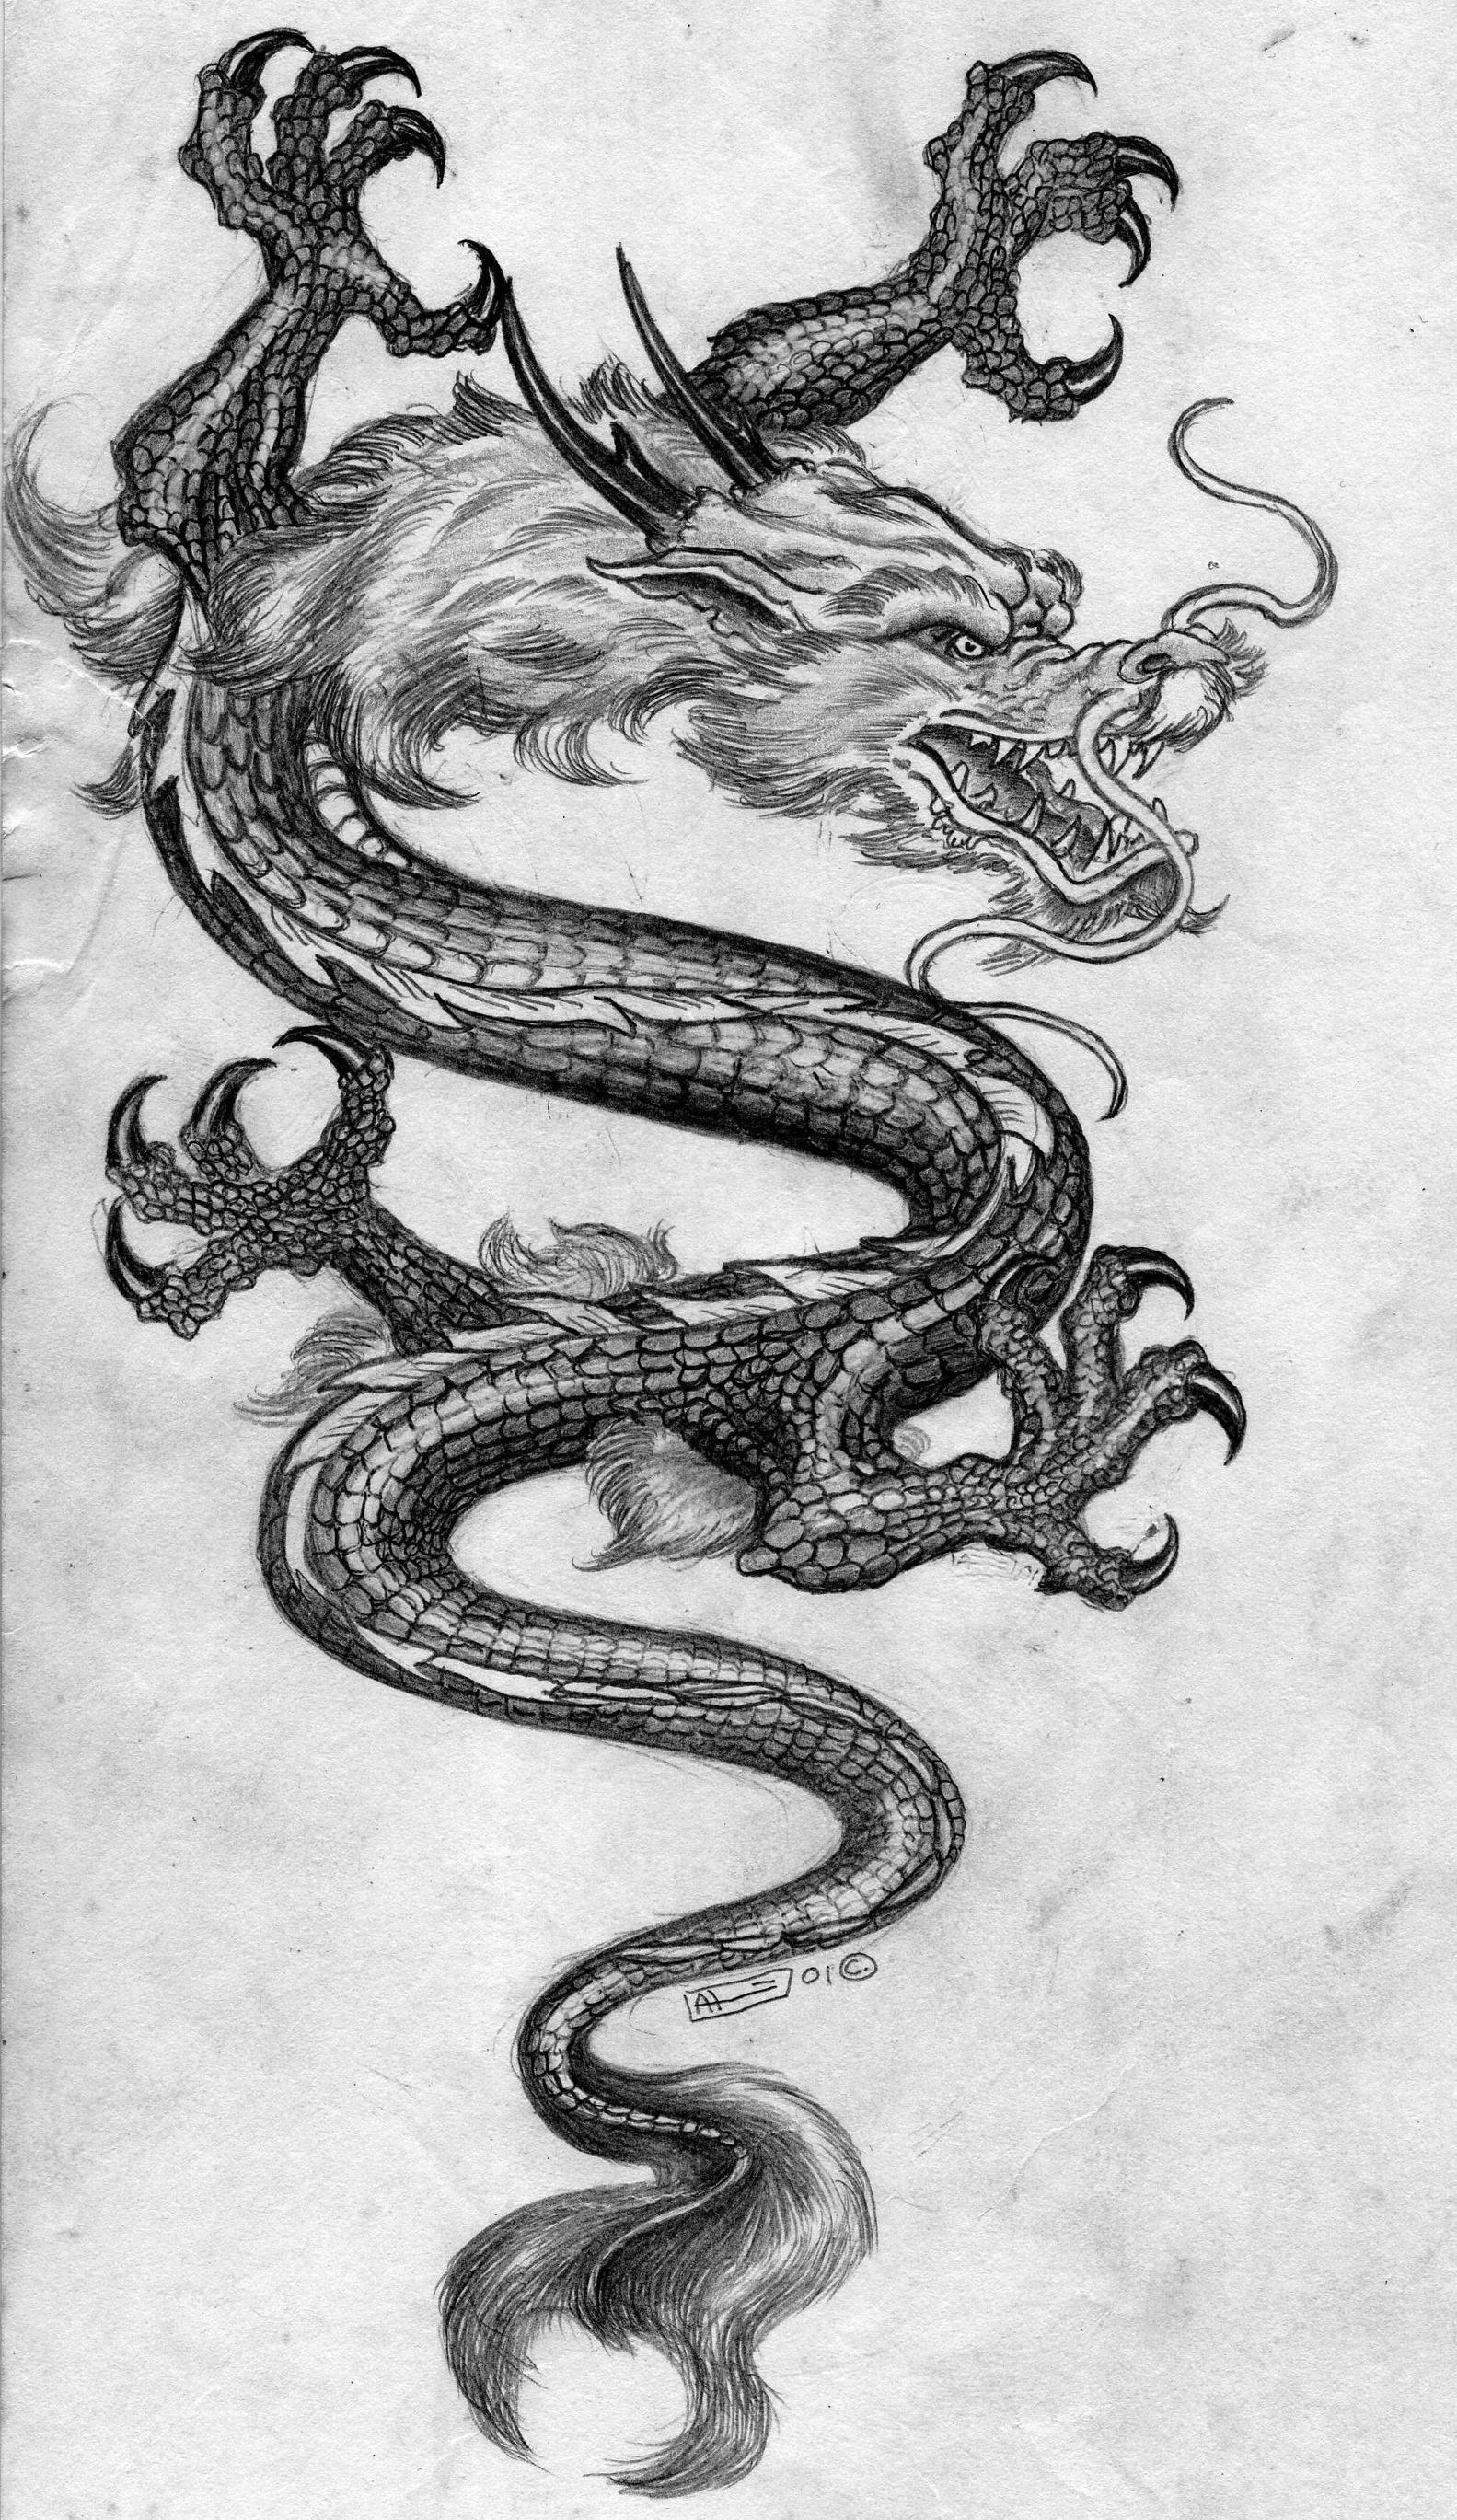 Chinese Dragon Pencil Sketch | Tattoo ideas | Pinterest ...